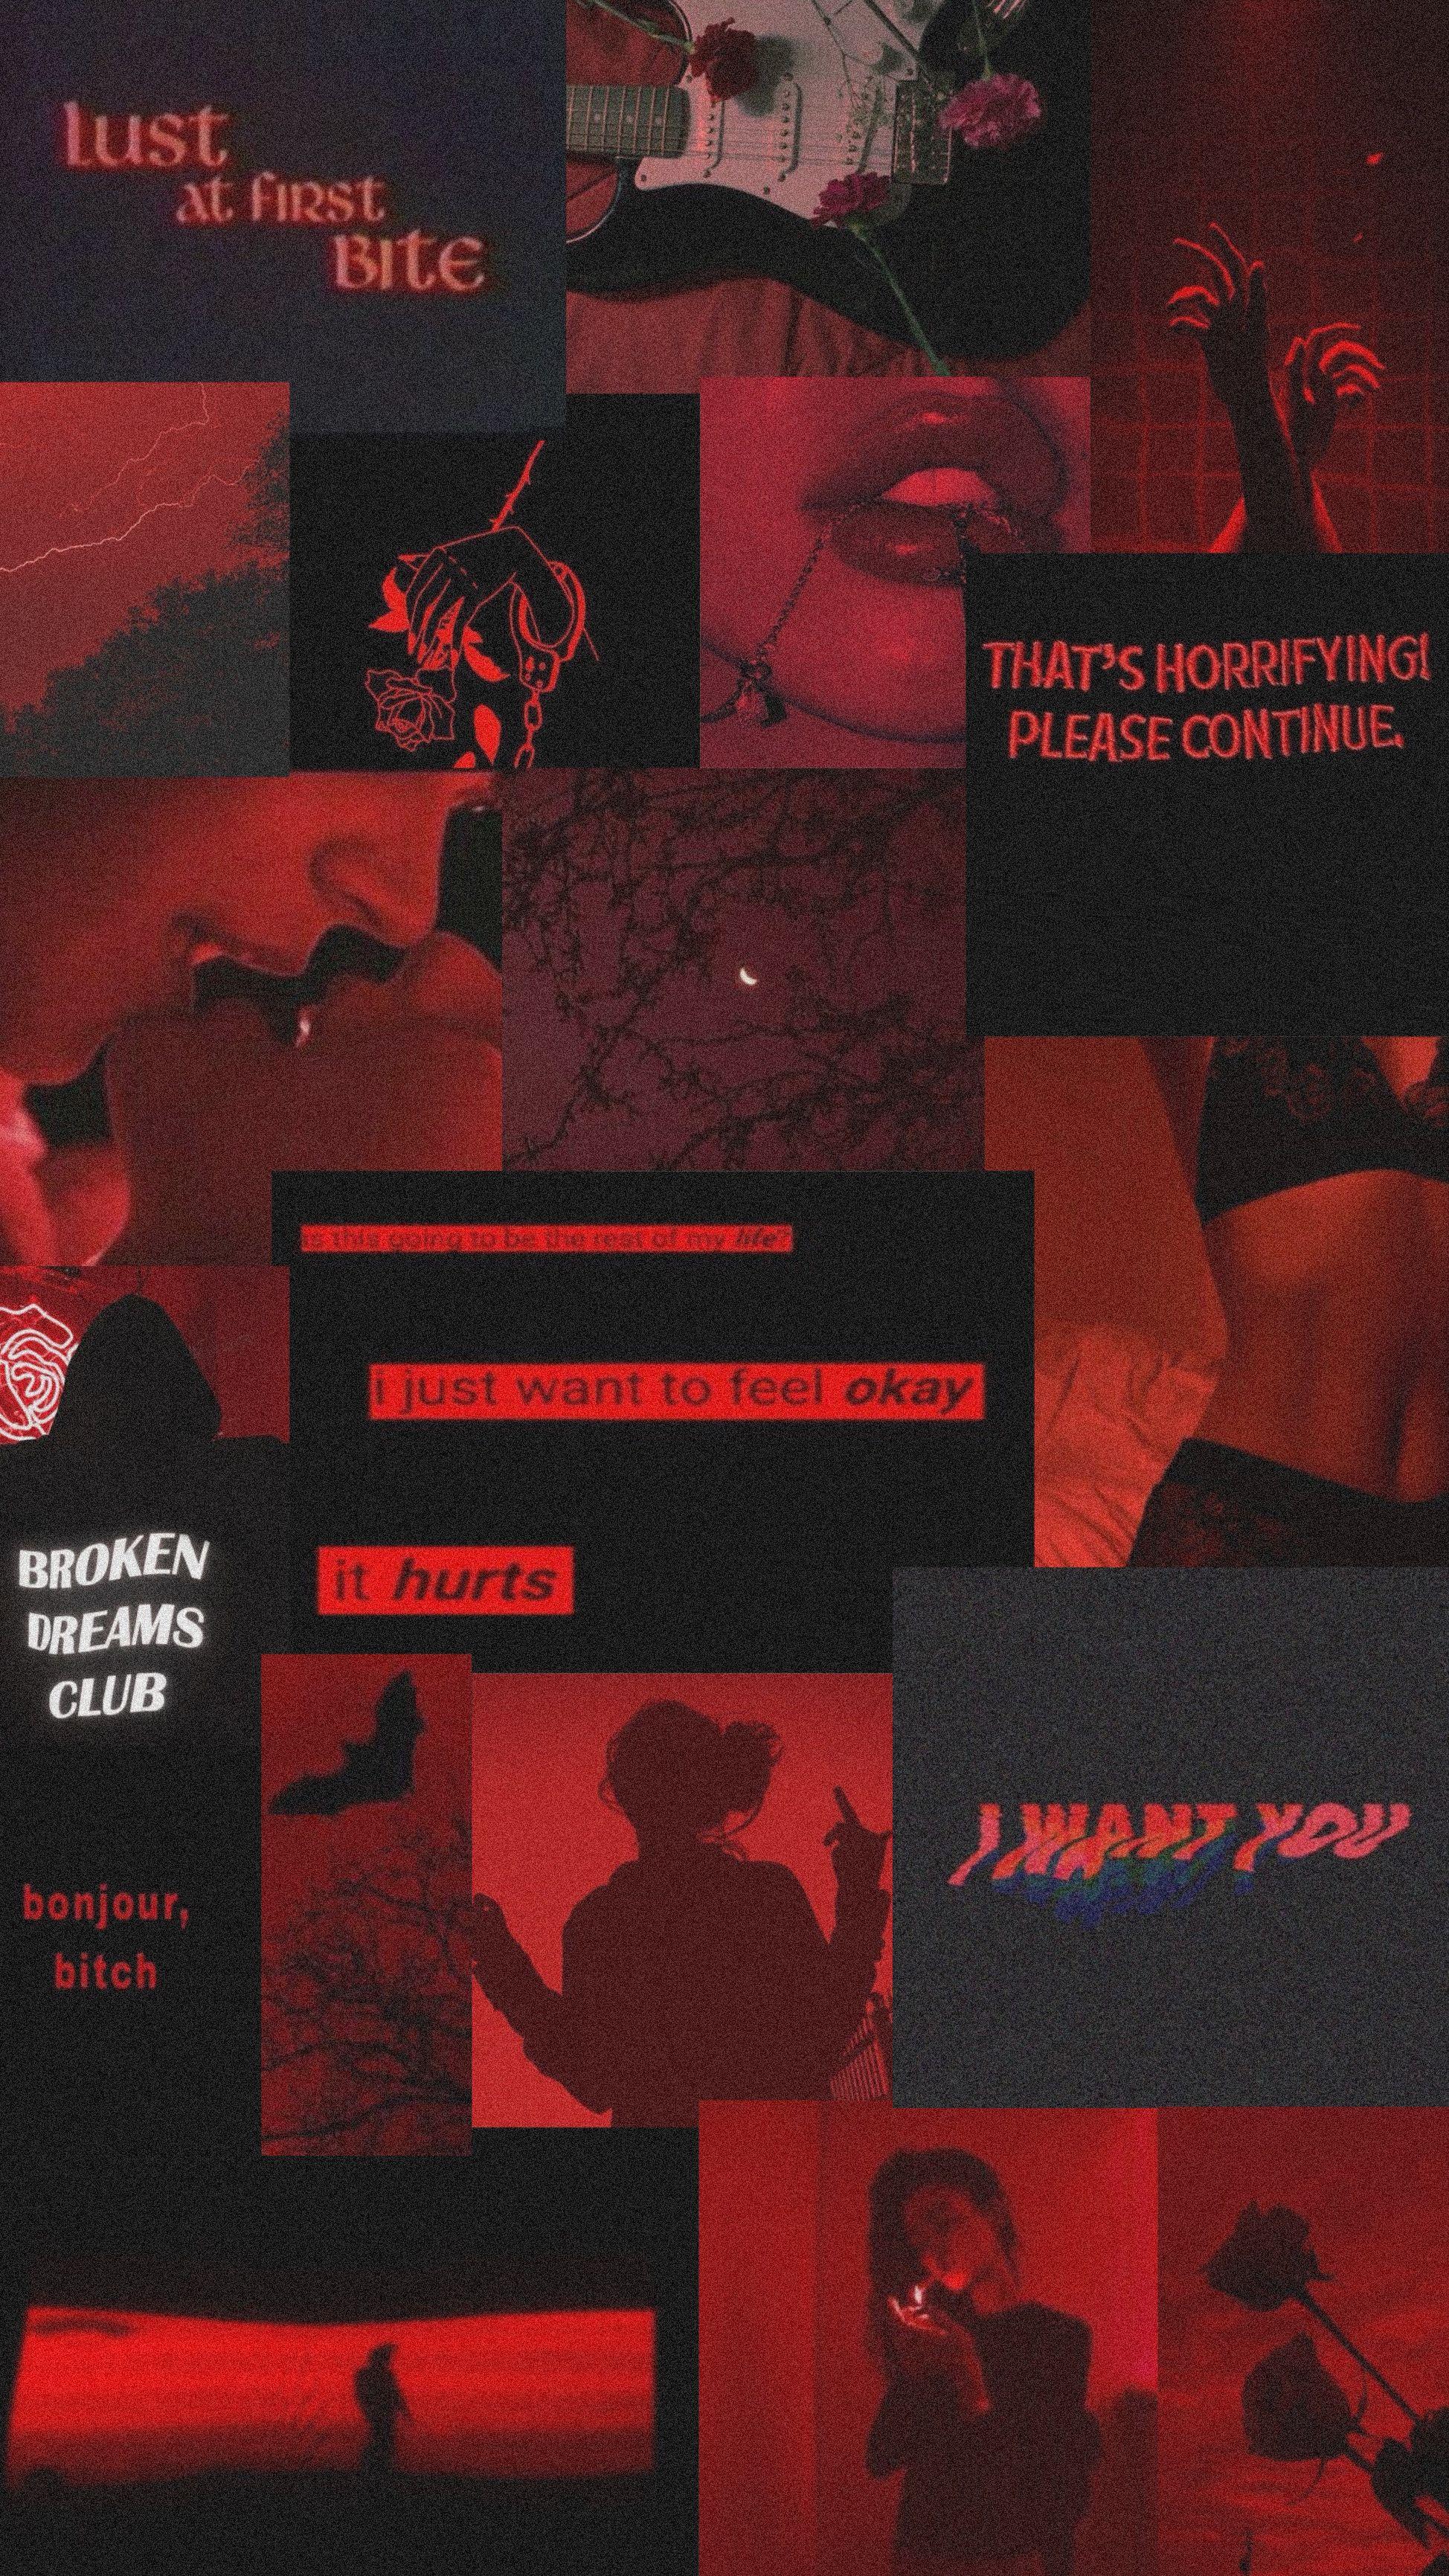 Red Grunge Wallpaper Dark Edgy Aesthetic Collage Background Trendy Cool Dark Re In 2020 Black Aesthetic Wallpaper Dark Red Wallpaper Edgy Wallpaper